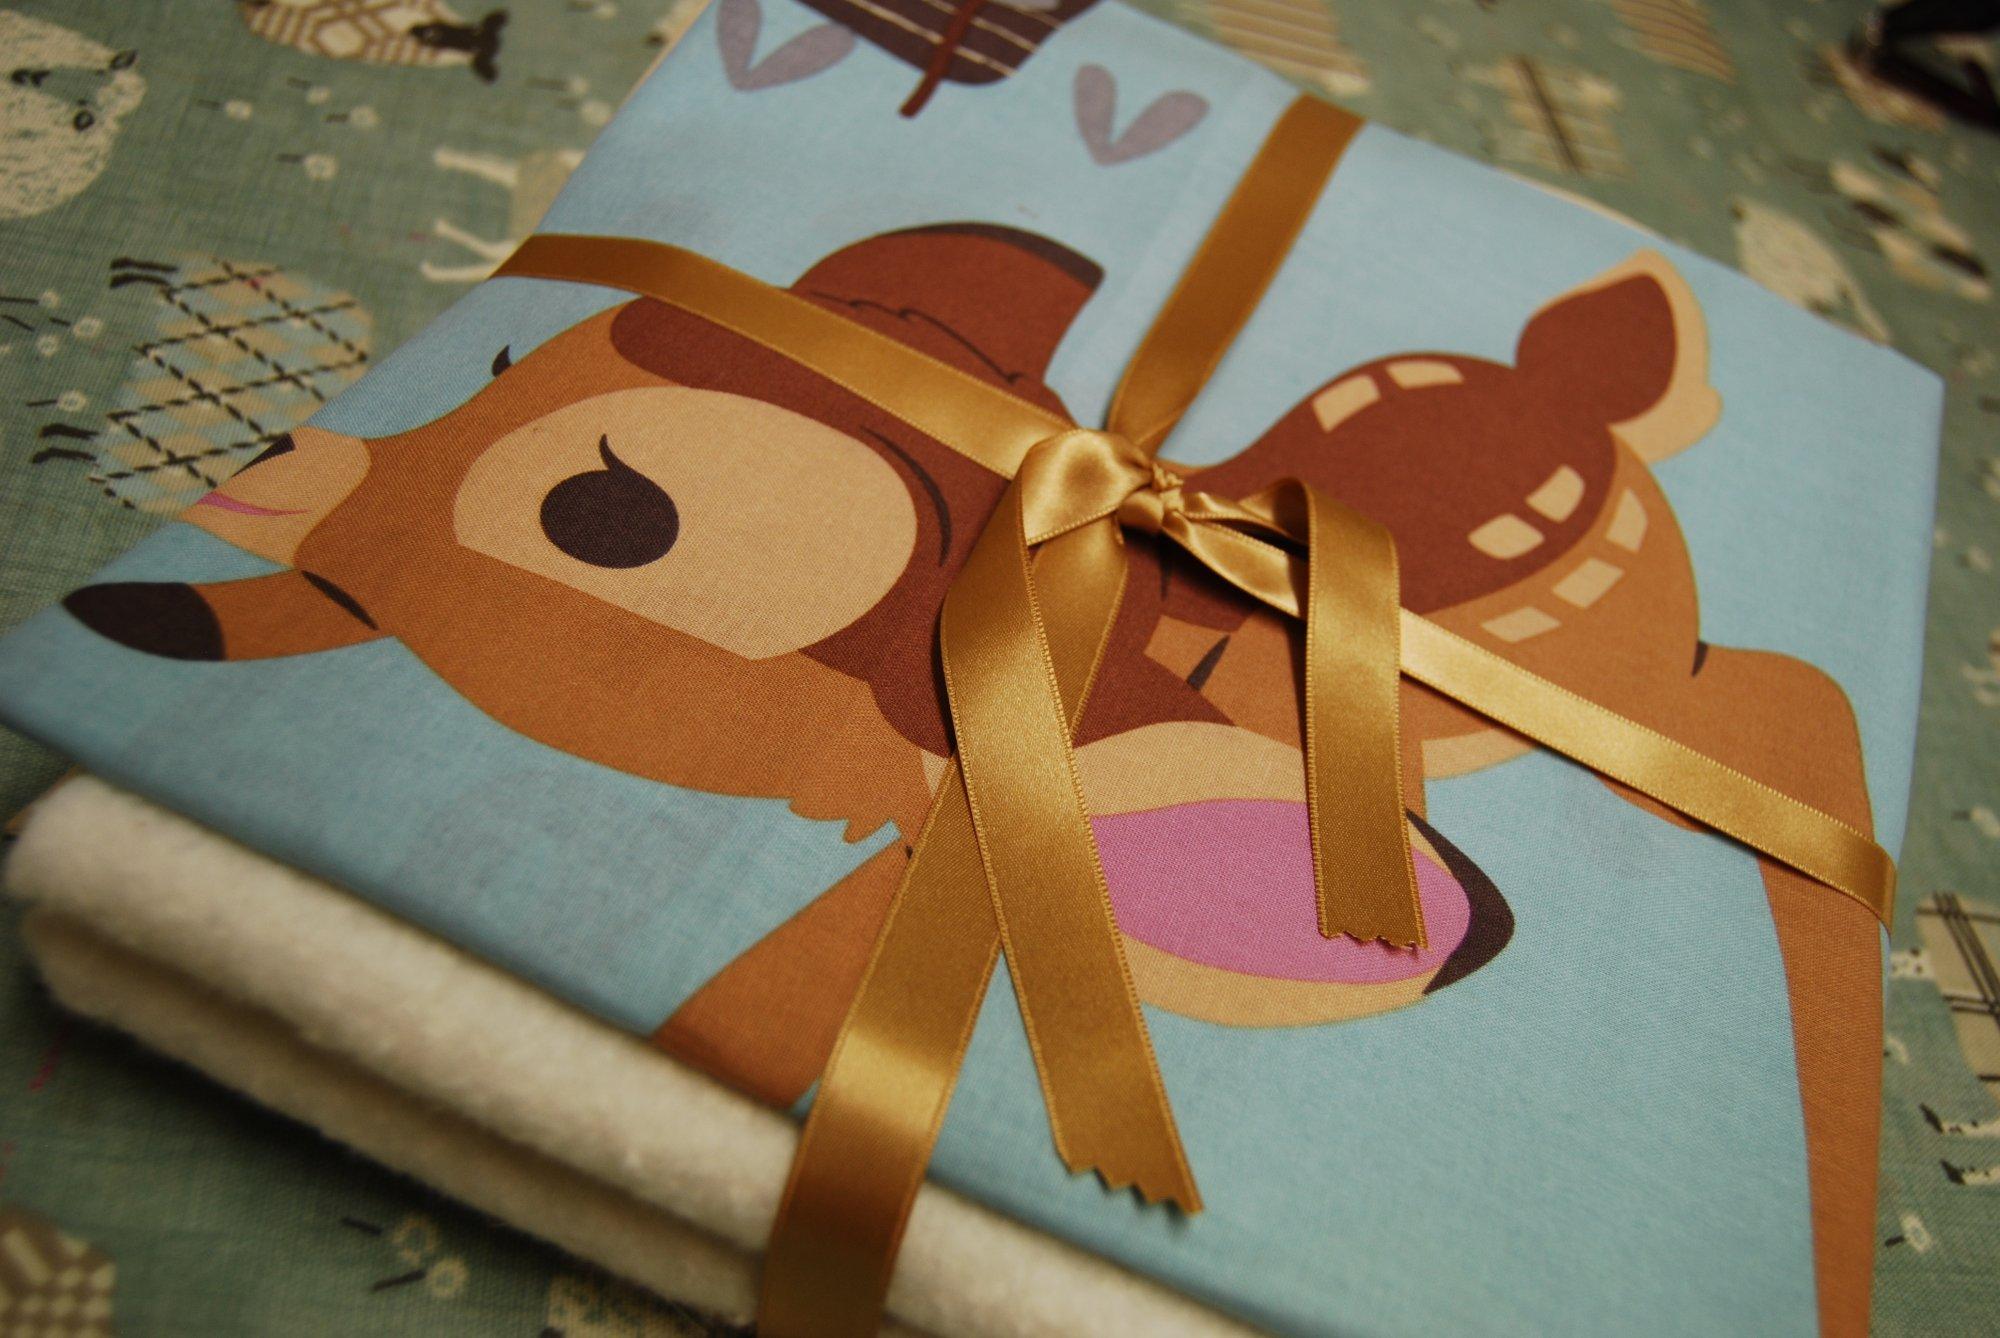 Disney Bambi 'Happy Together' Panel Kit